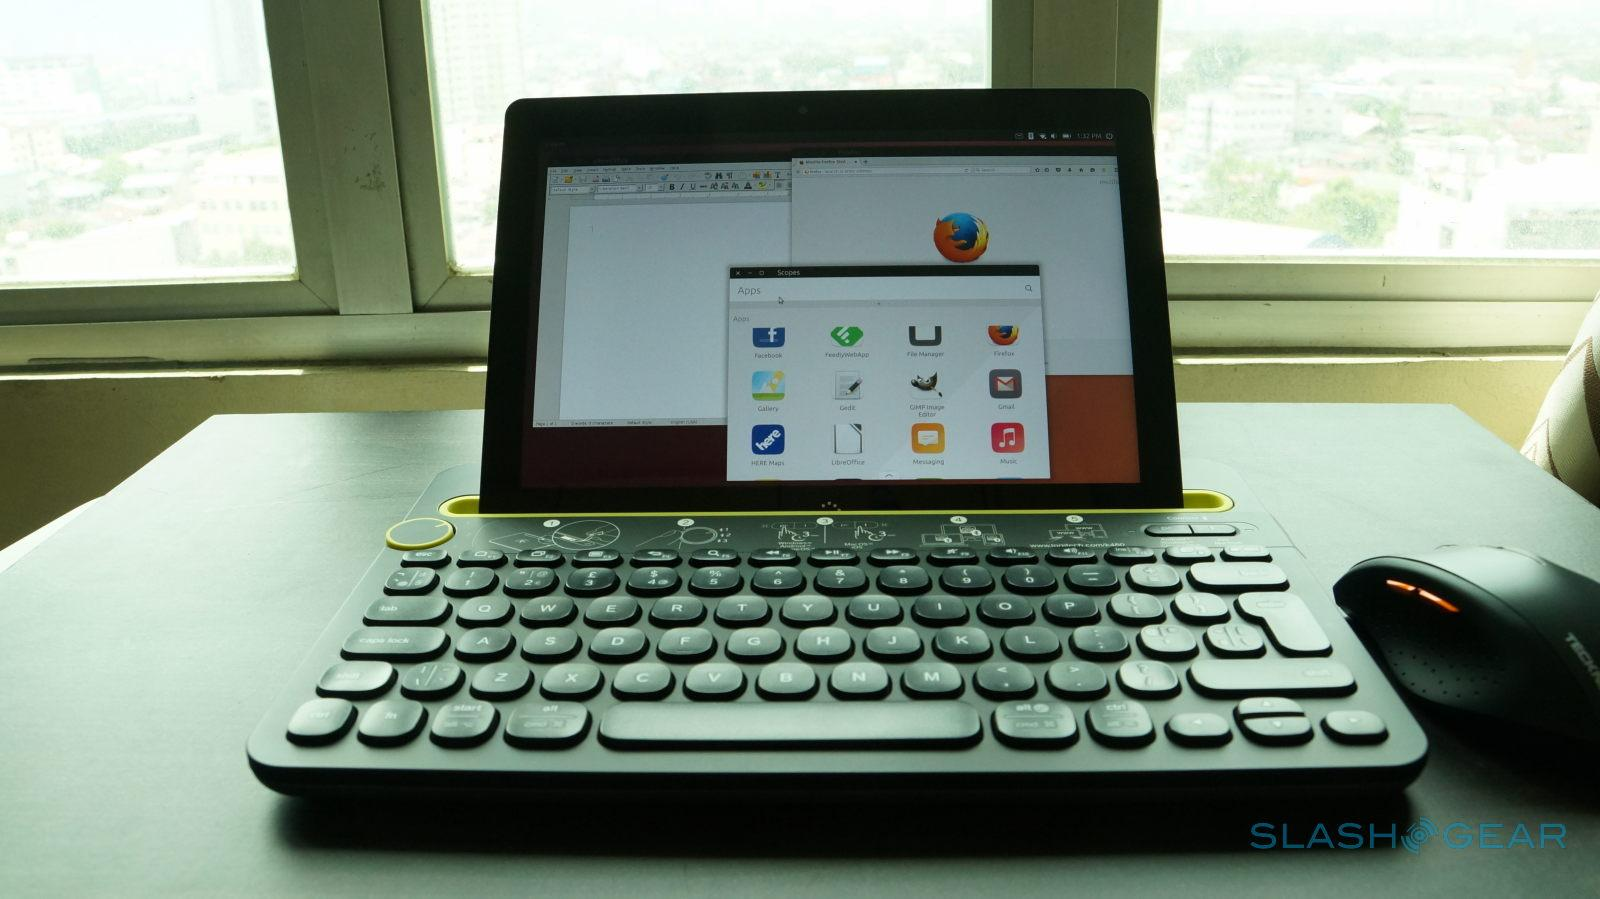 Ubuntu BQ Aquaris M10 Review – Part 1: Hardware - SlashGear